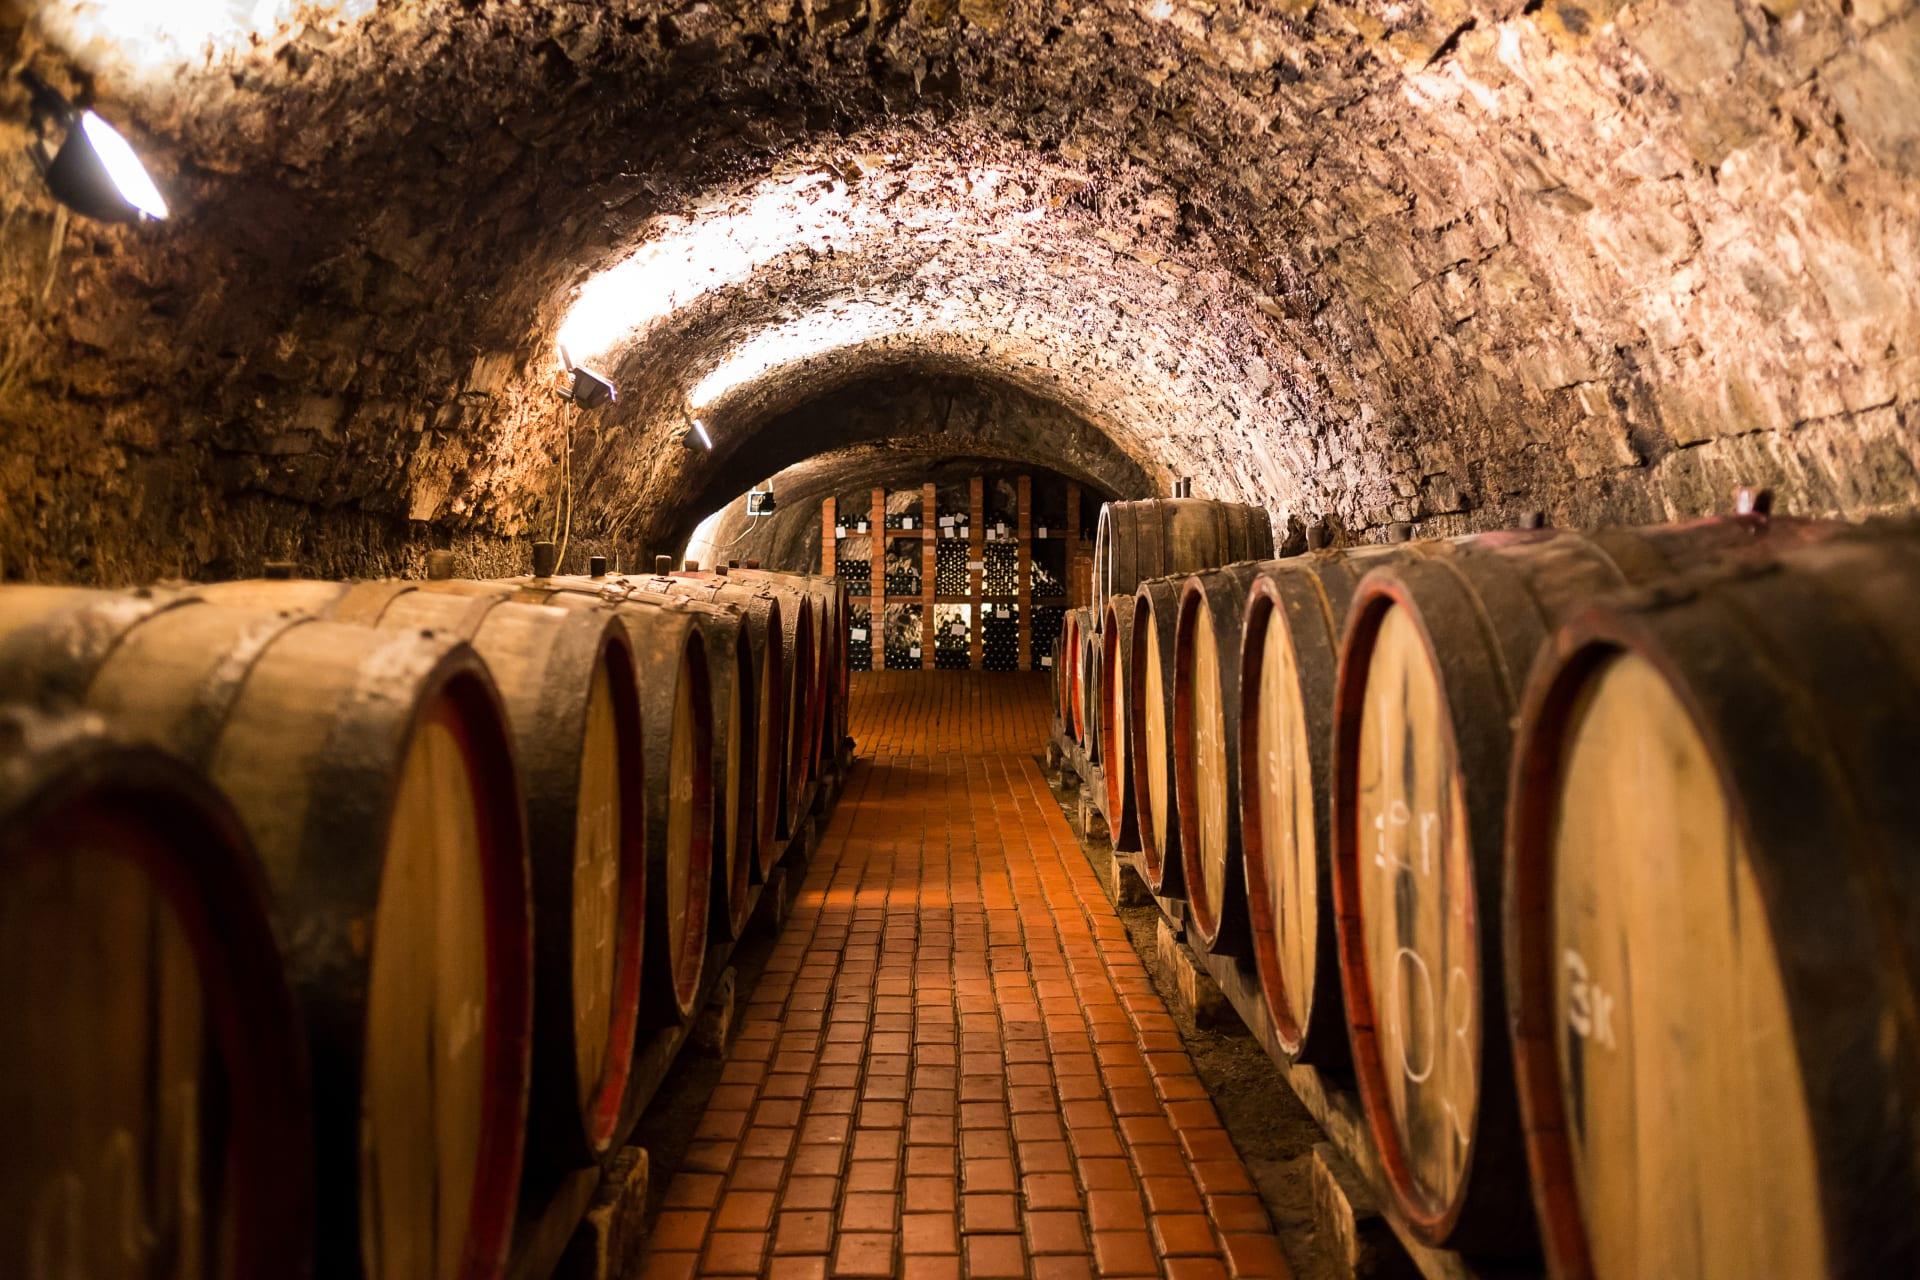 Gaia - Port Wine Cellar - Real Companhia Velha